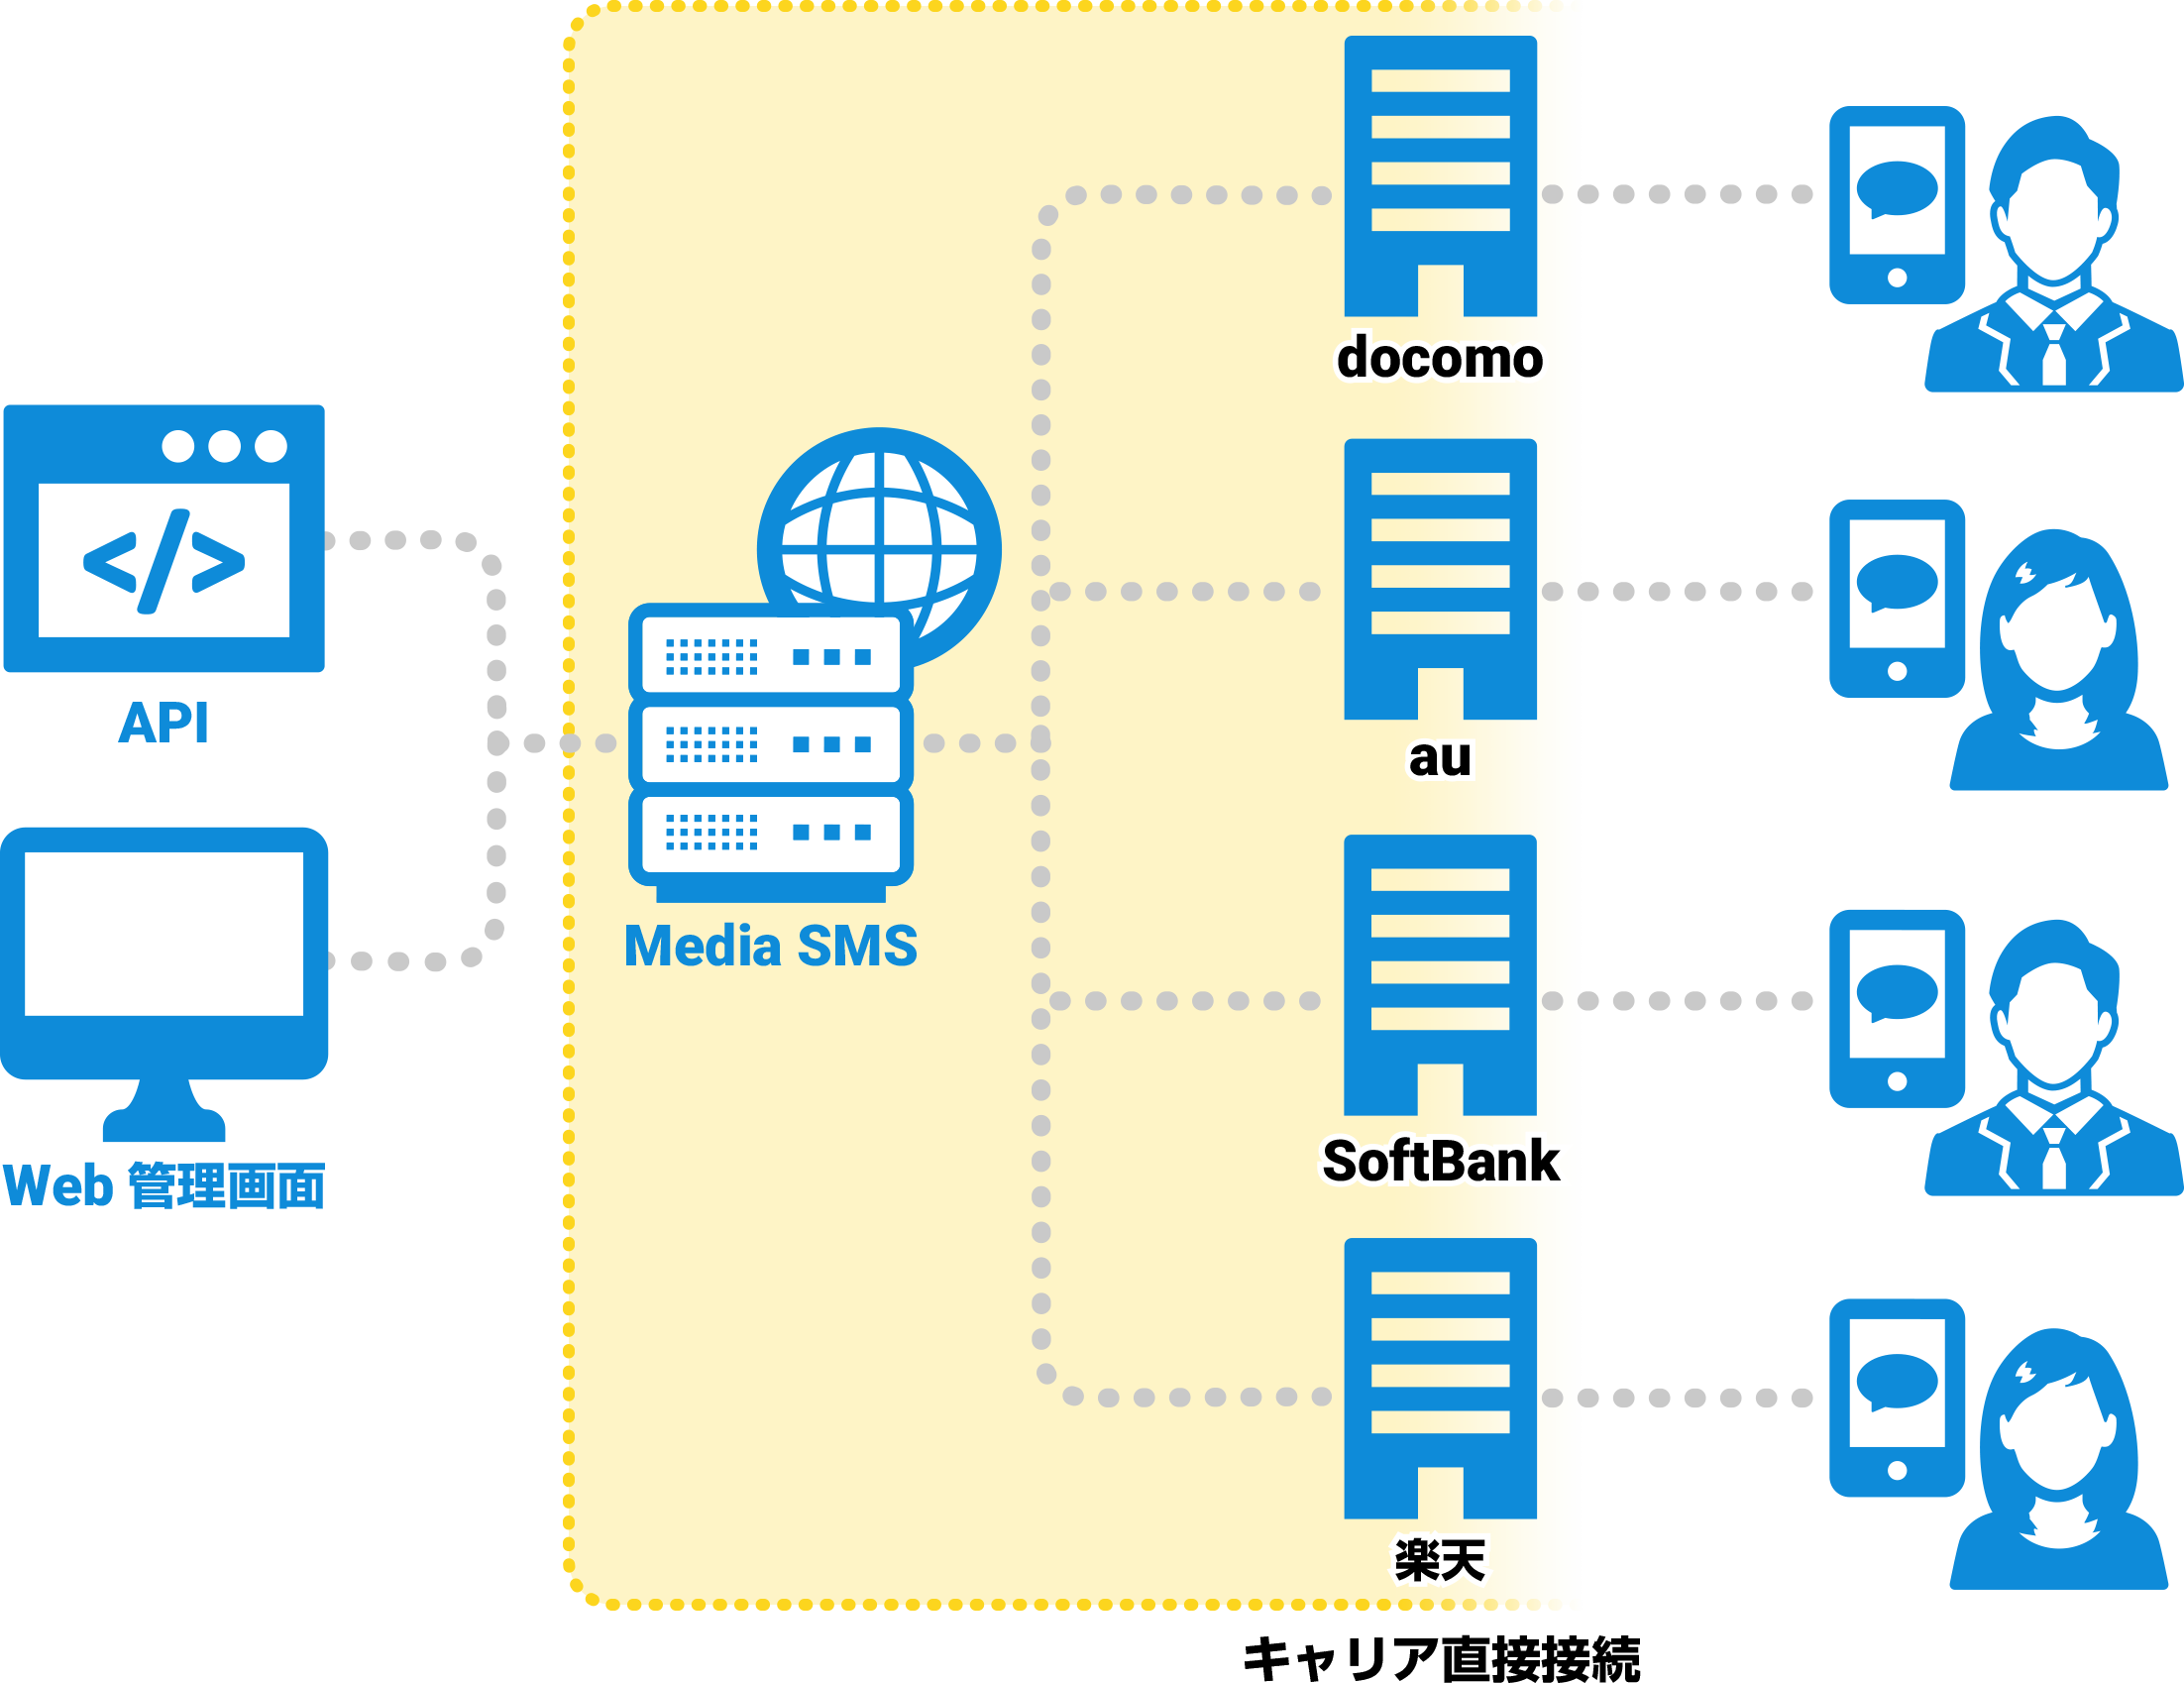 SMSサービスの構造